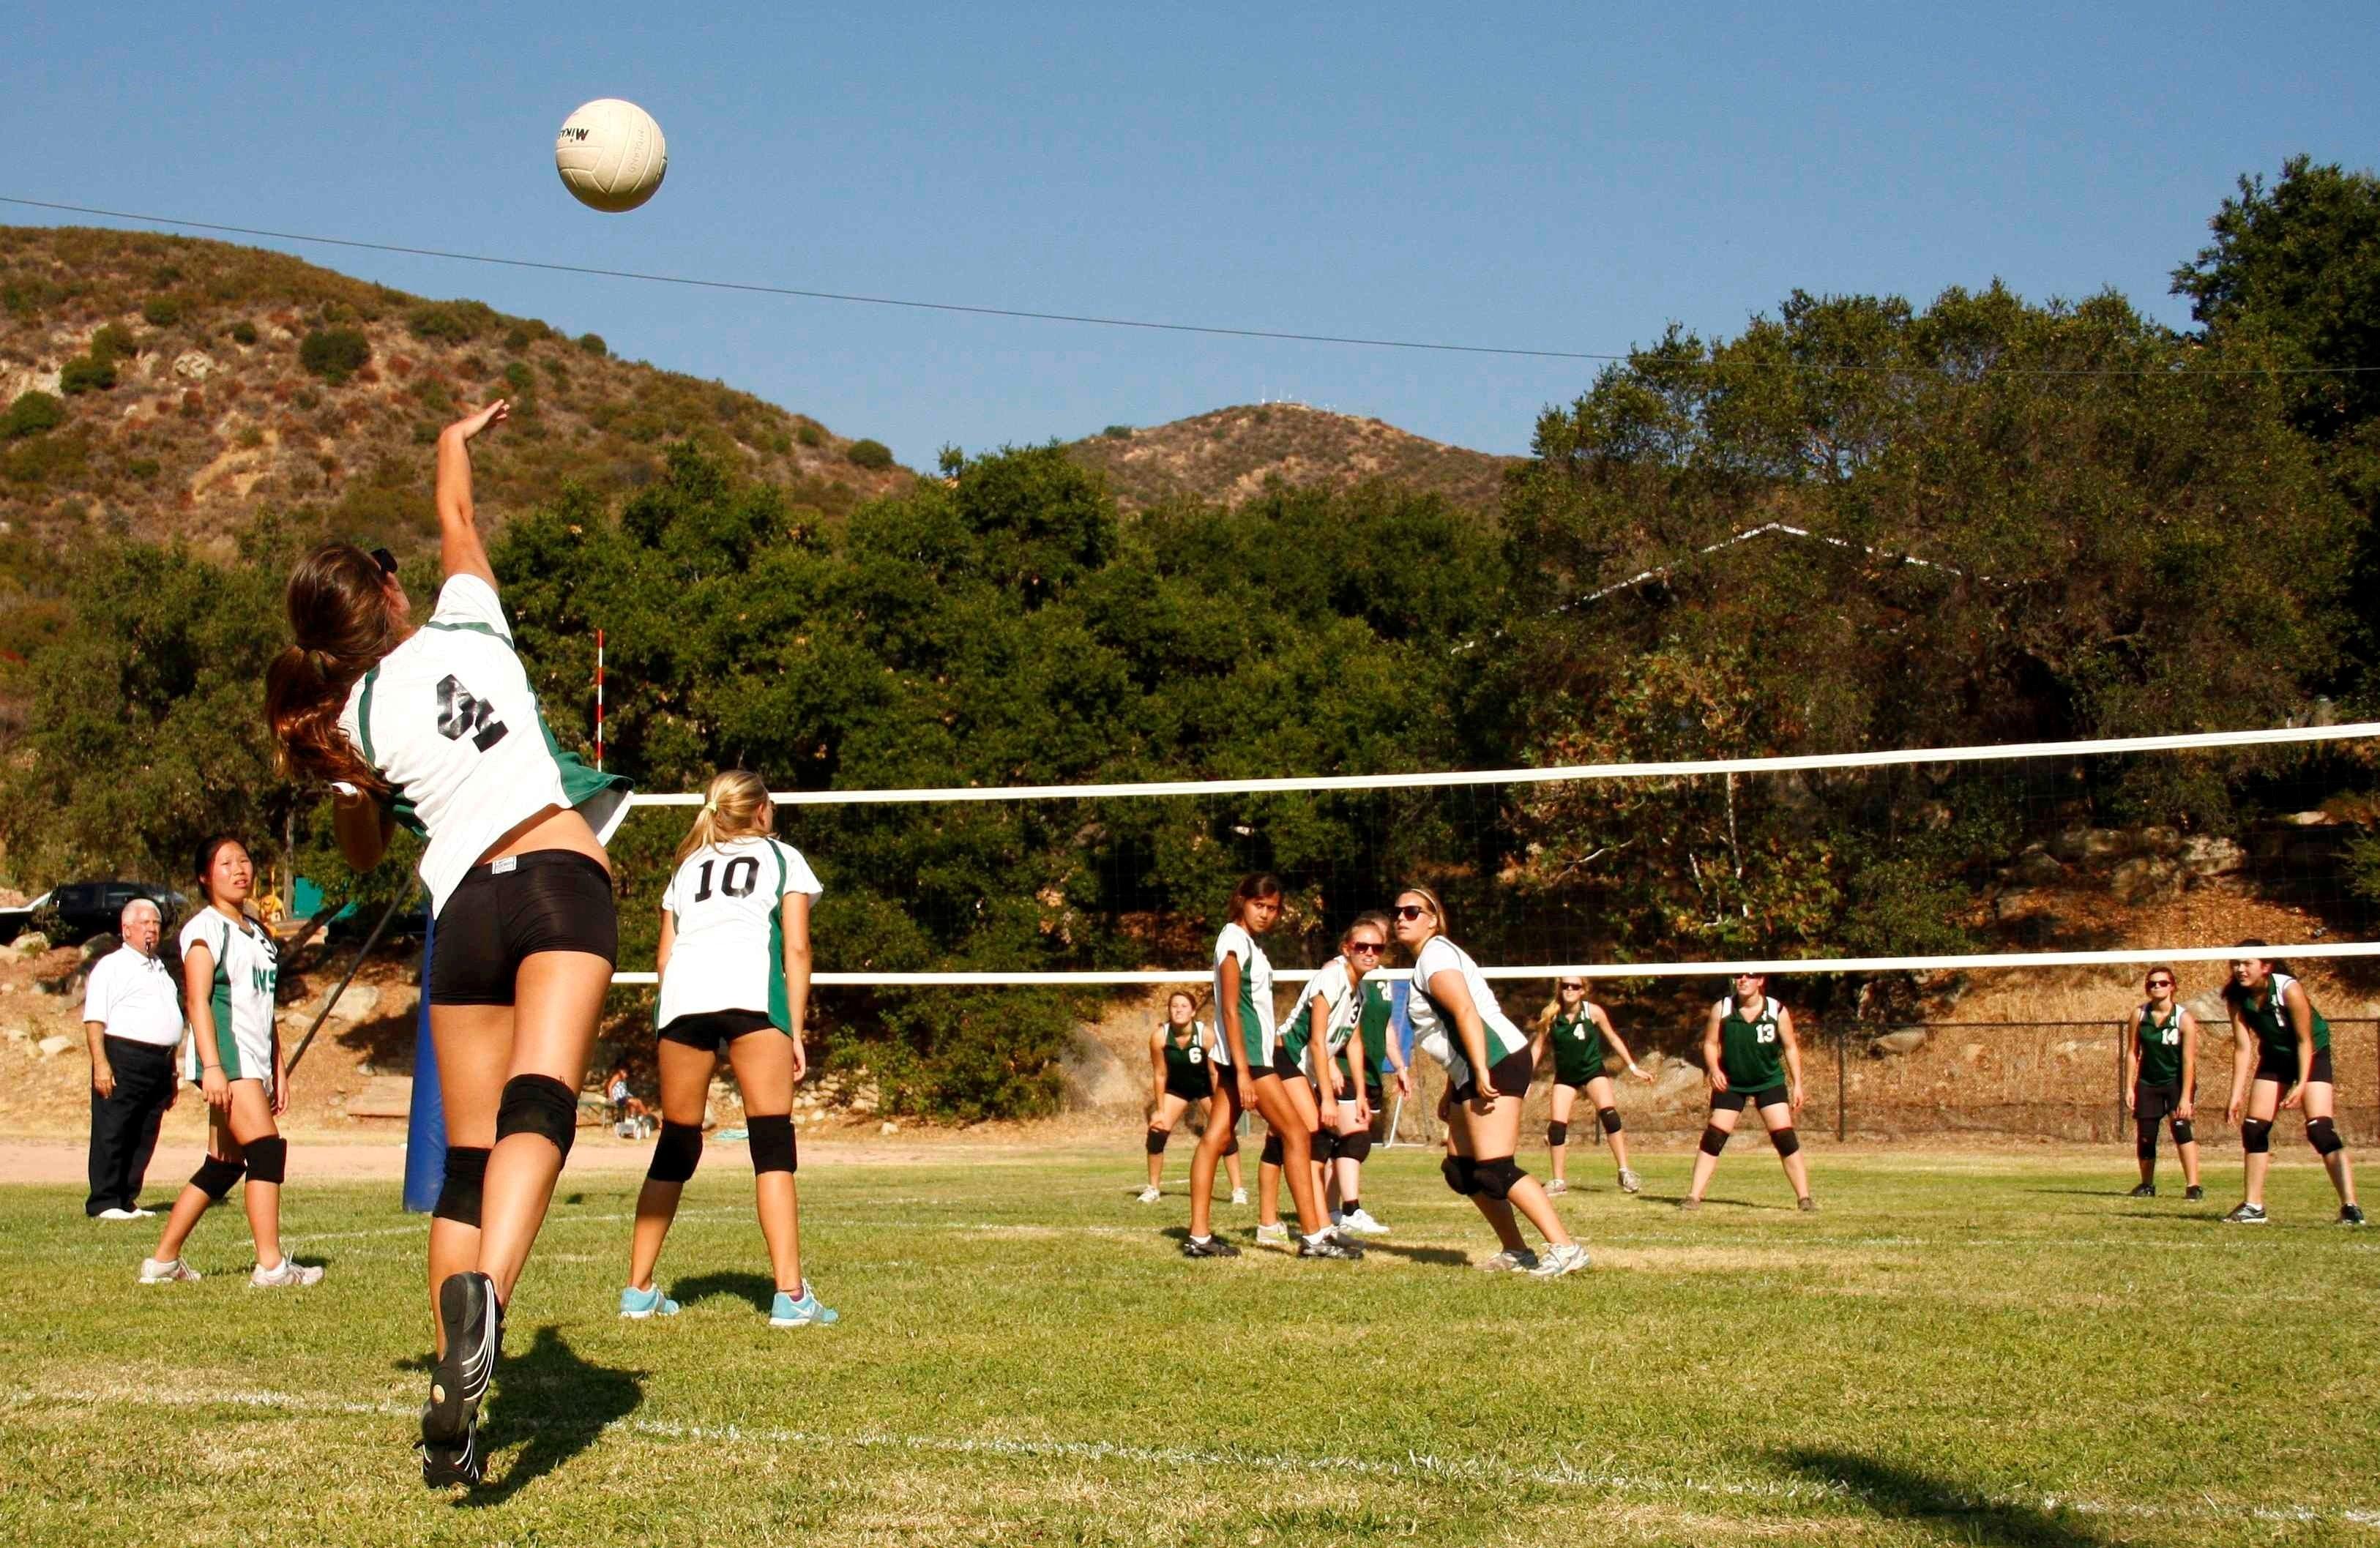 Sport Wallpaper Volleyball: Volleyball Backgrounds ·① WallpaperTag